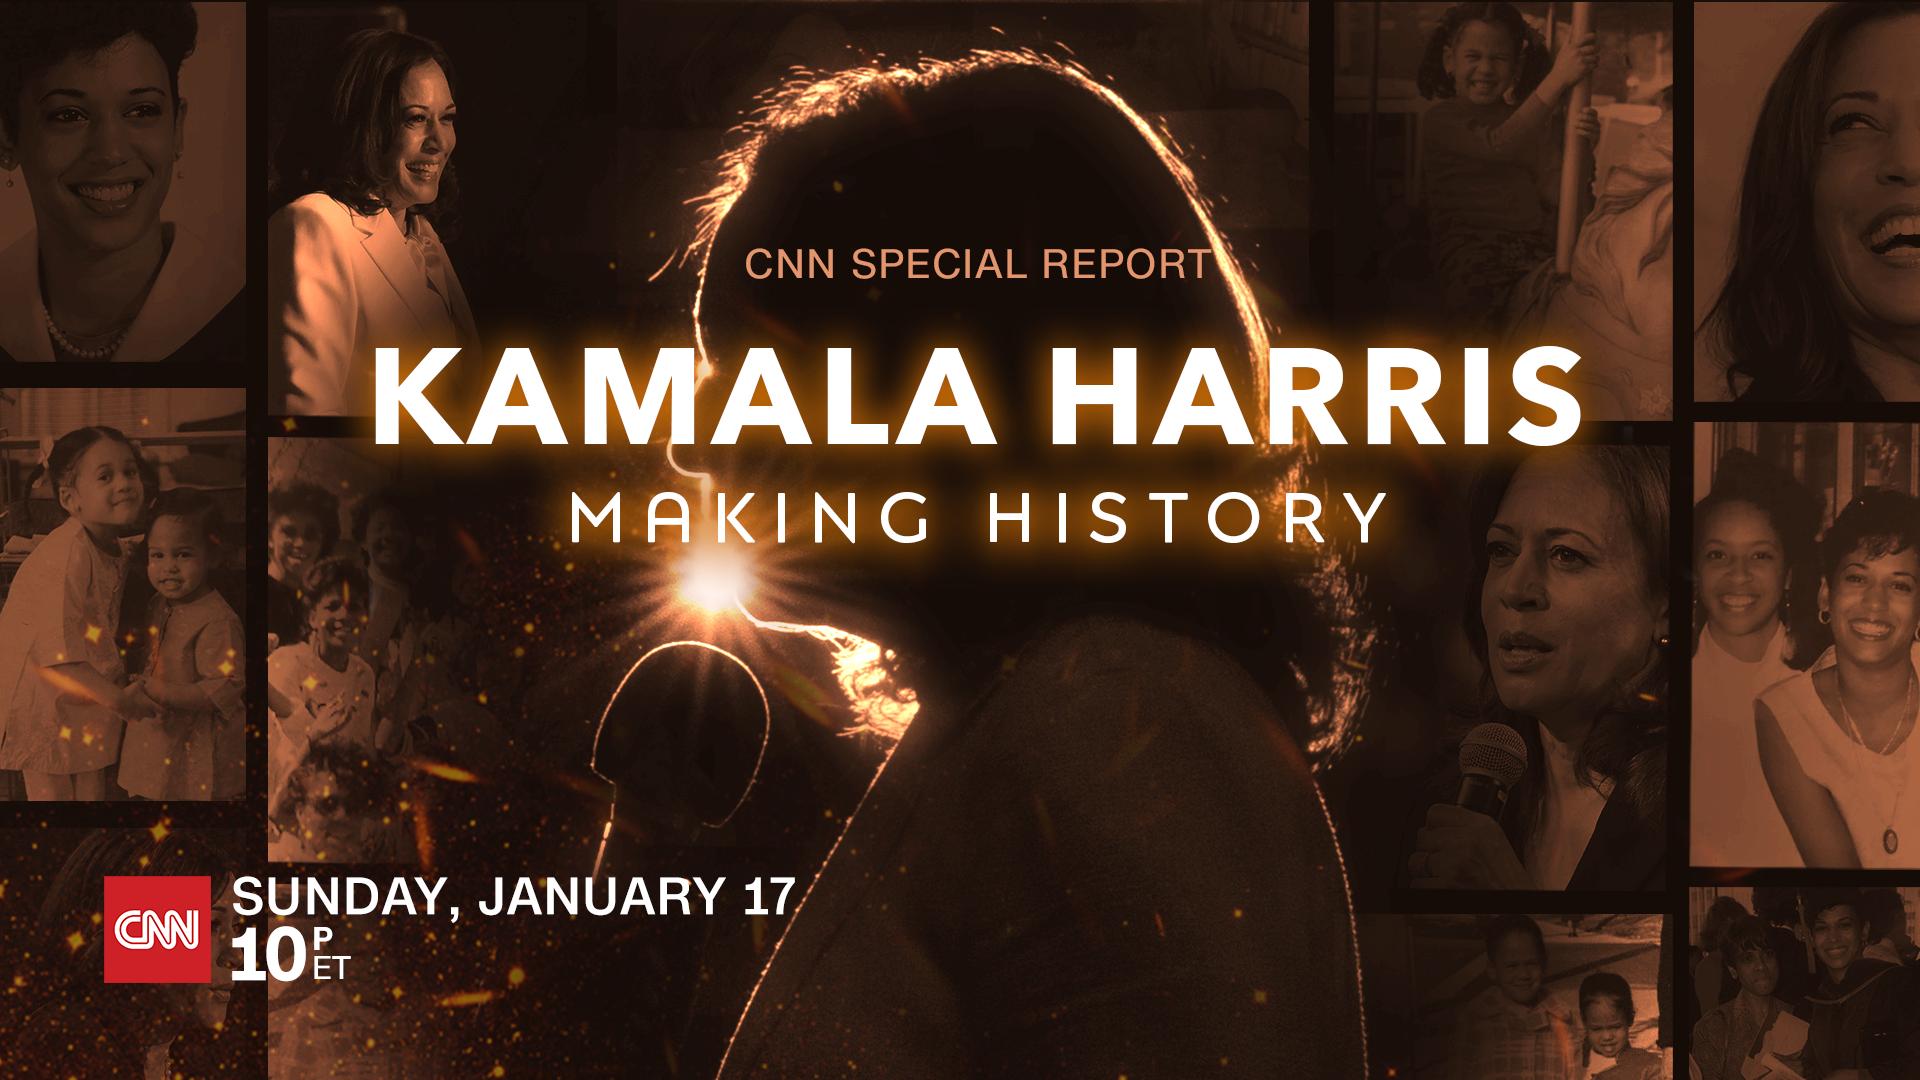 cnnpressroom.blogs.cnn.com: CNN SPECIAL REPORT: Kamala Harris: Making History